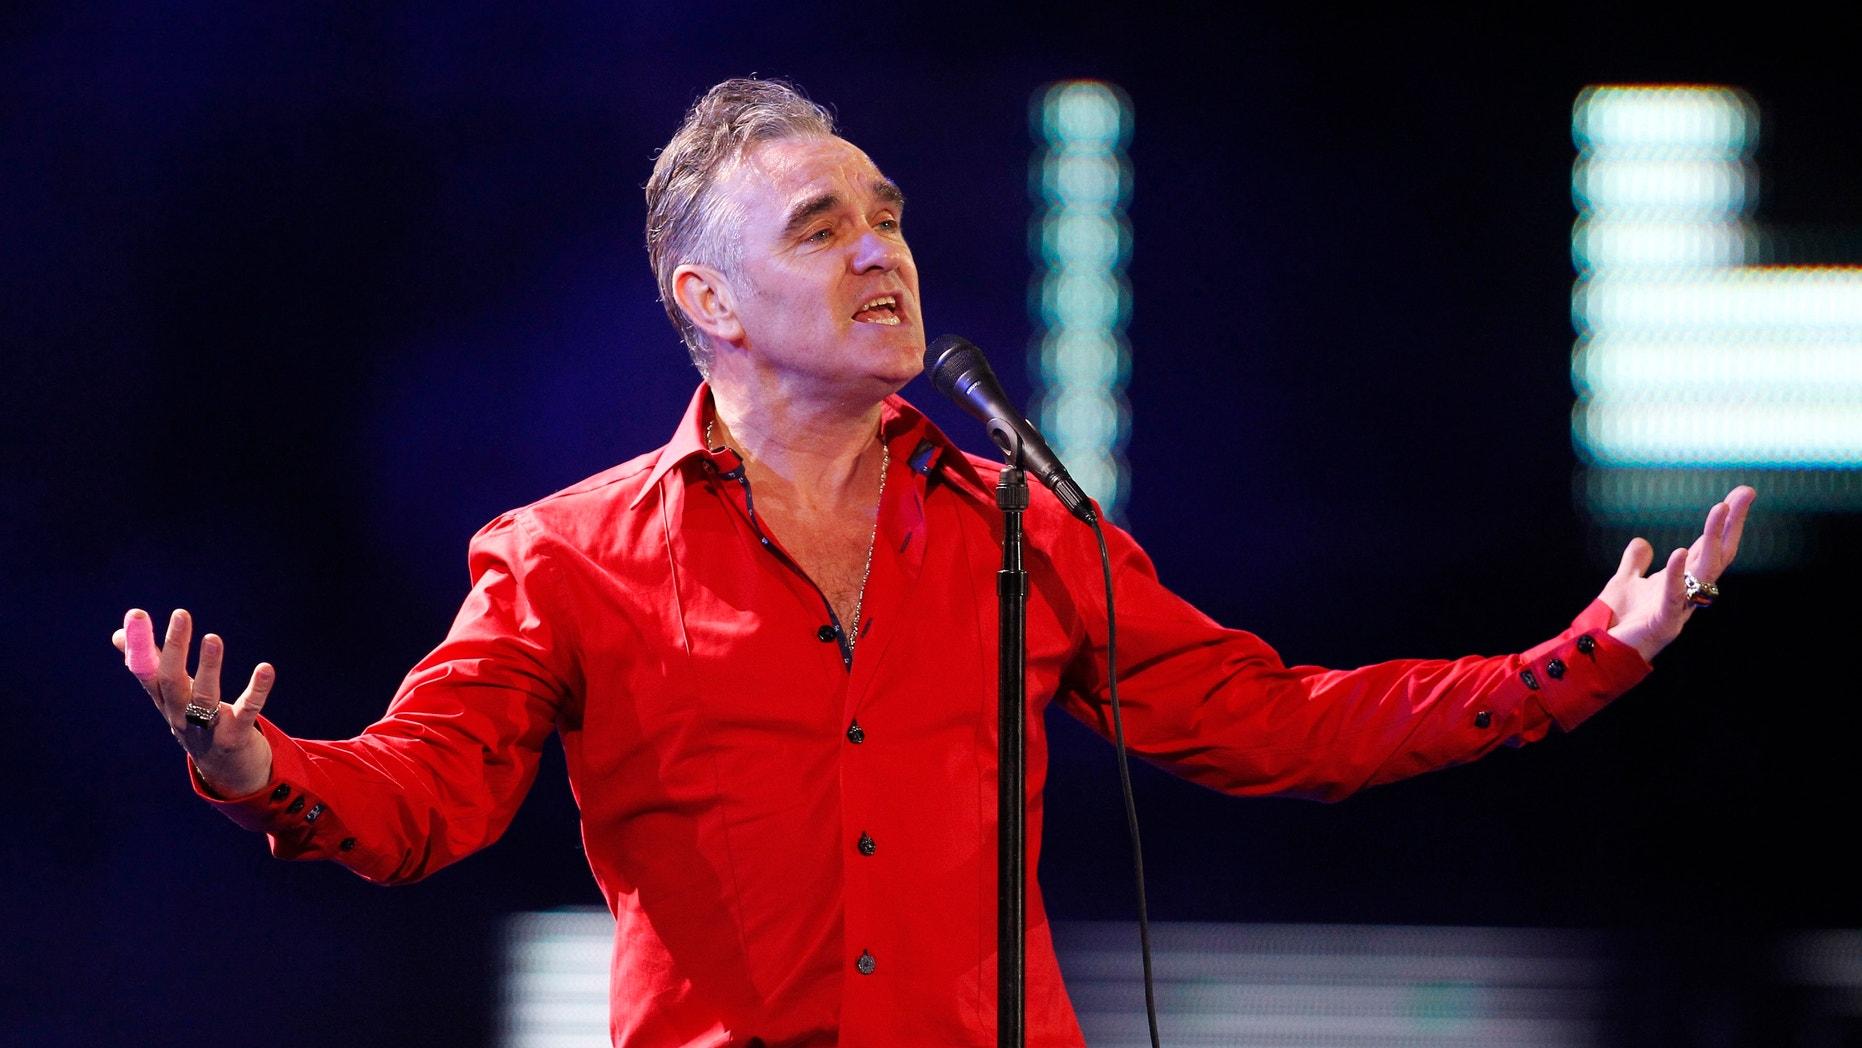 British singer-songwriter Morrissey performs during the International Song Festival in Vina del Mar city, February 24, 2012.